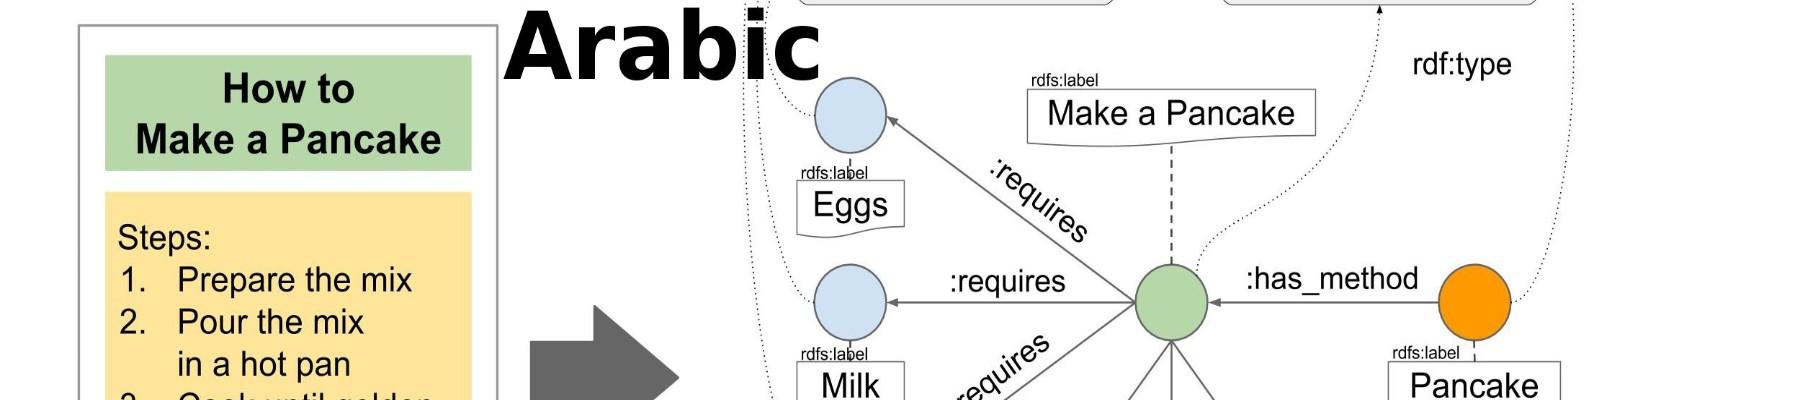 491896d64 Human Instructions - Arabic (wikiHow) | Kaggle